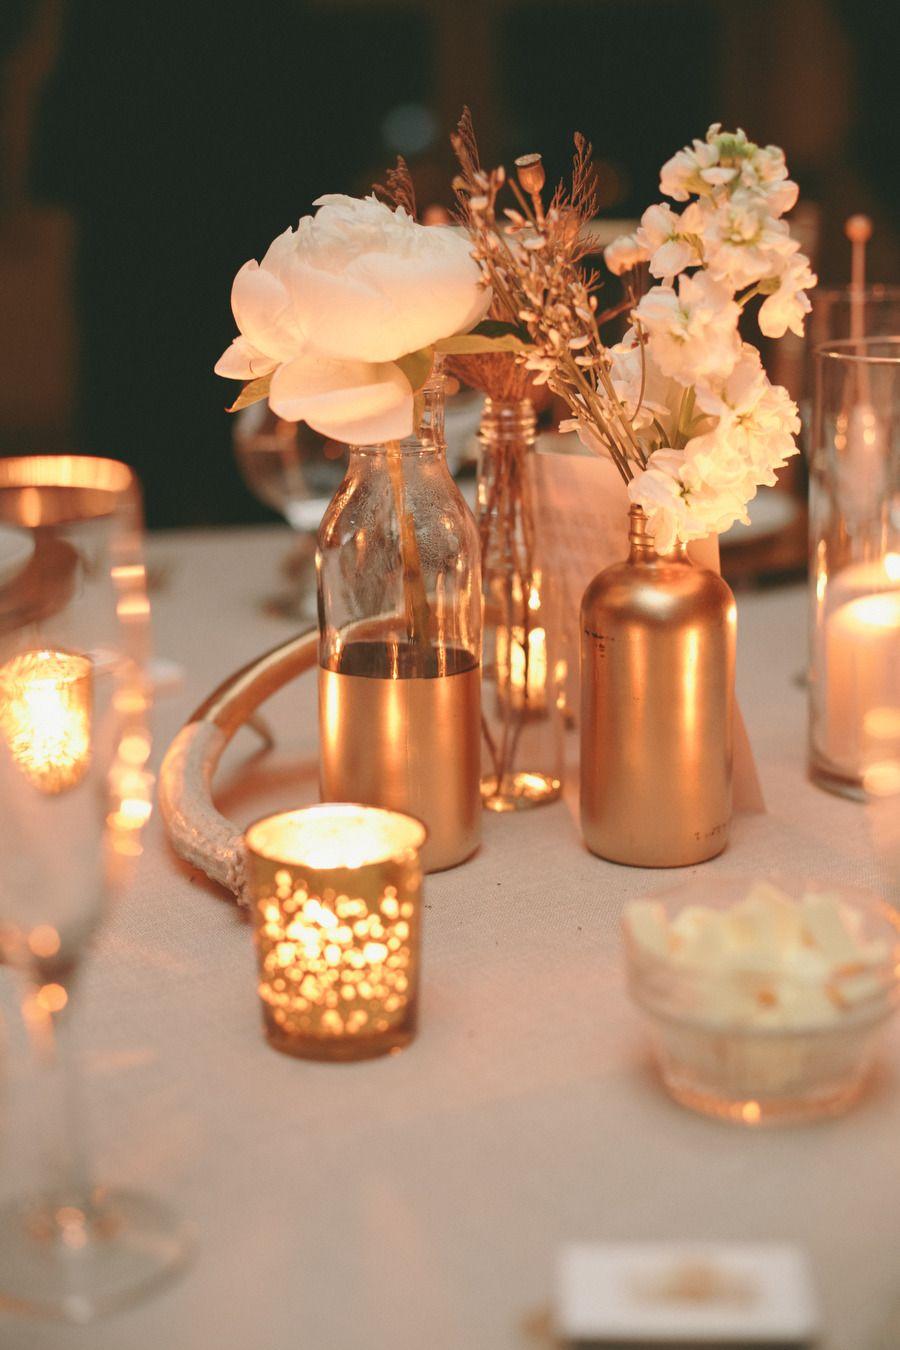 Cozy Union Hill Inn Wedding Gold Wedding Centerpieces Rose Gold Centerpiece Wedding Table